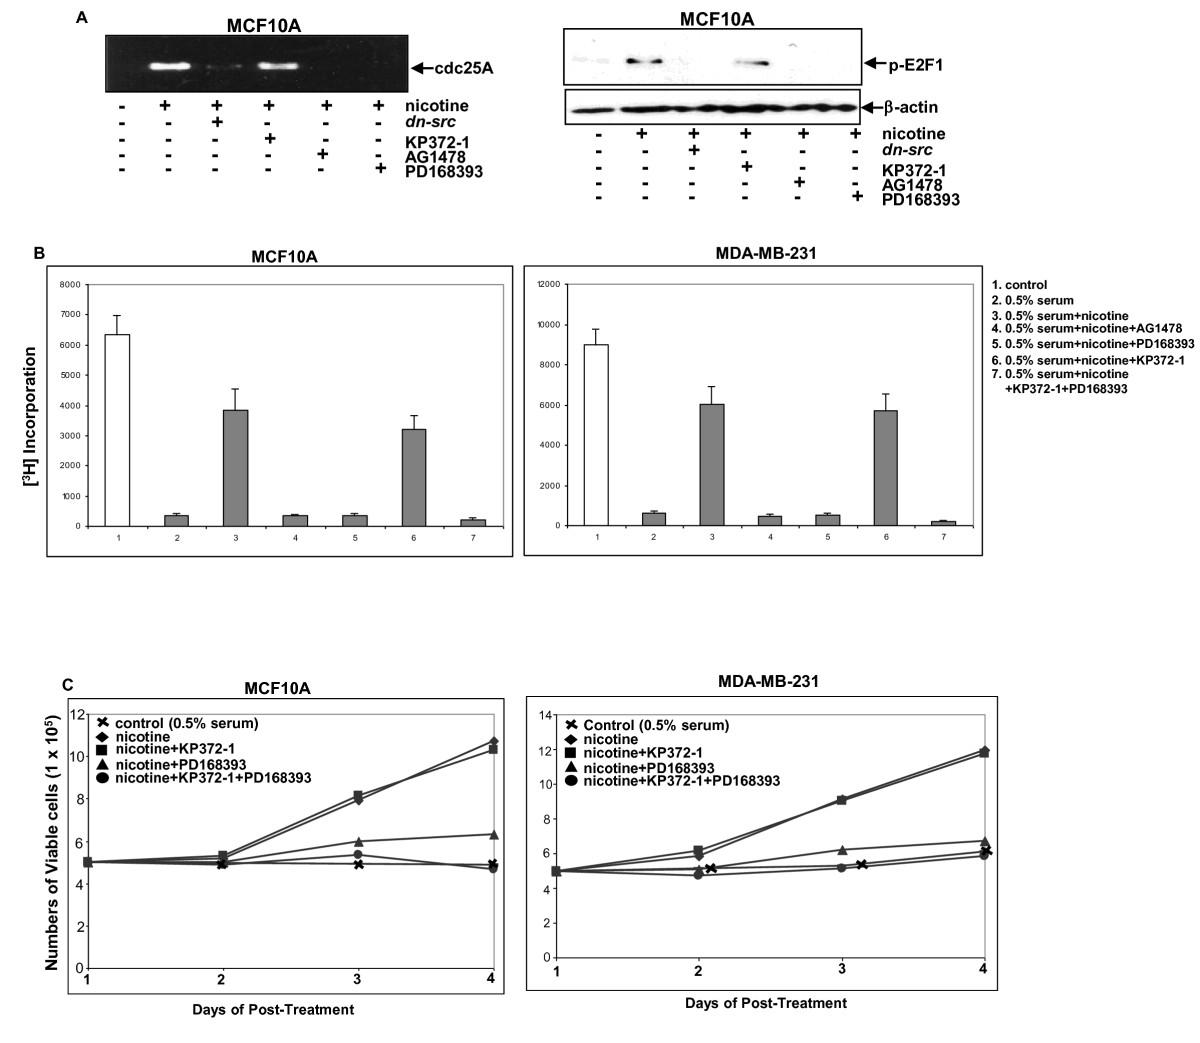 https://static-content.springer.com/image/art%3A10.1186%2Fbcr3055/MediaObjects/13058_2011_2856_Fig5_HTML.jpg